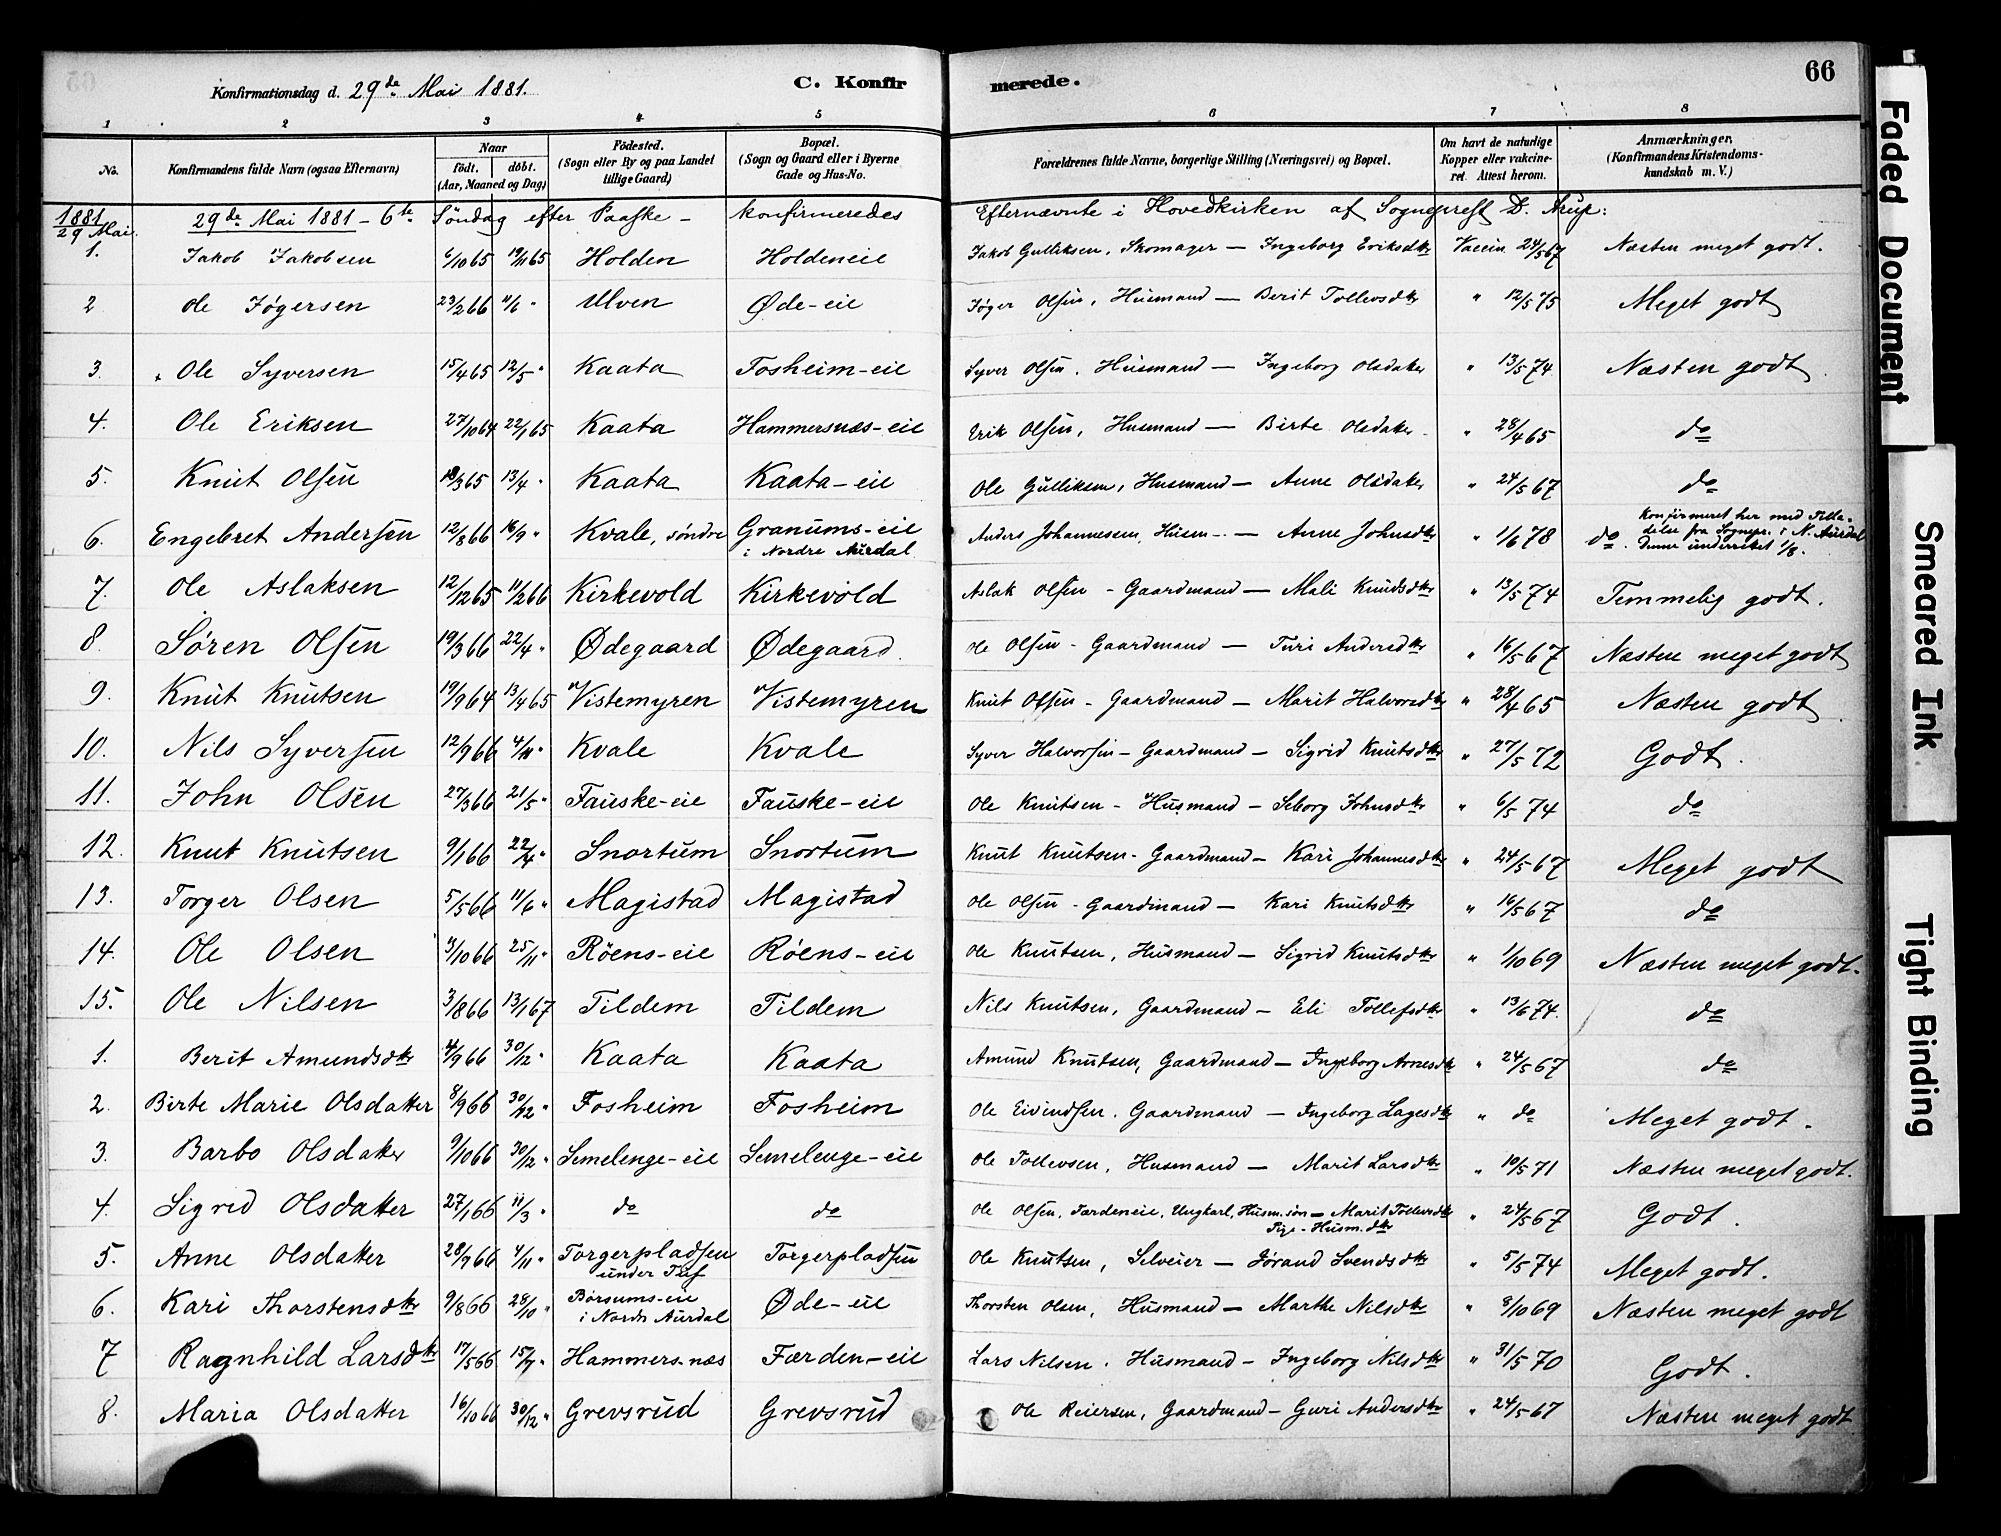 SAH, Vestre Slidre prestekontor, Ministerialbok nr. 6, 1881-1912, s. 66